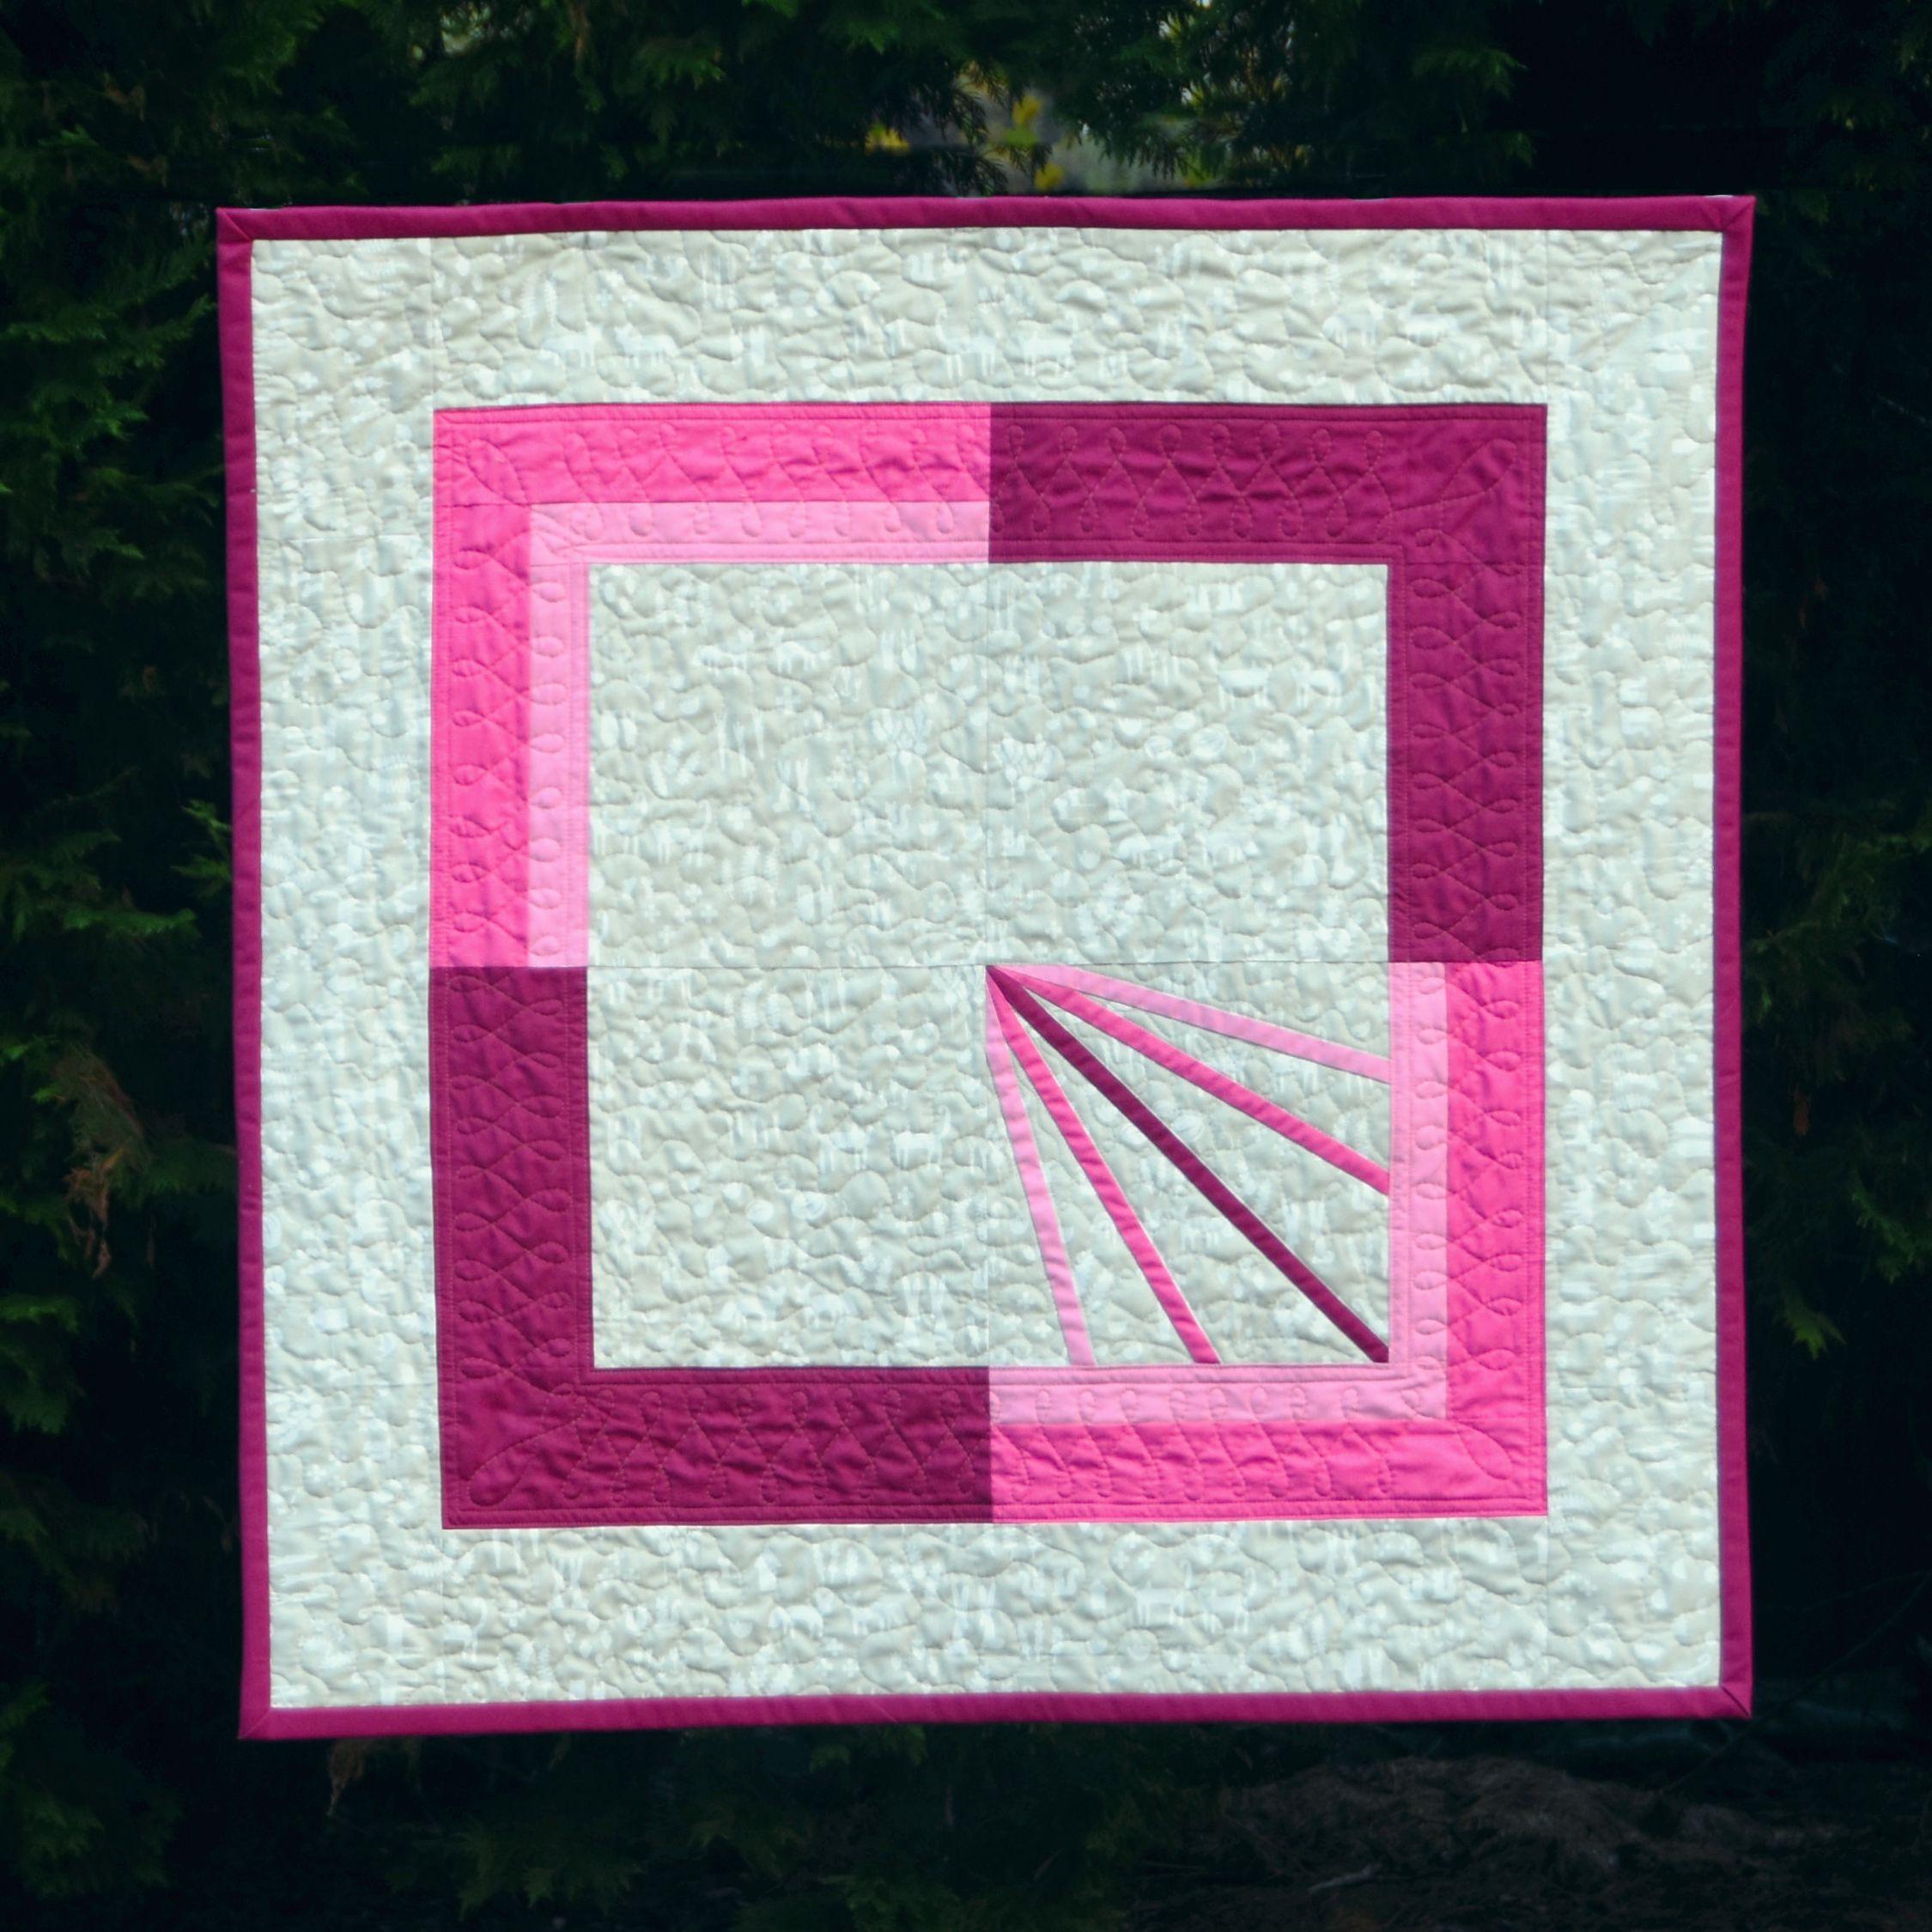 Diffraction Block Baby Quilt by Cheryl Brickey